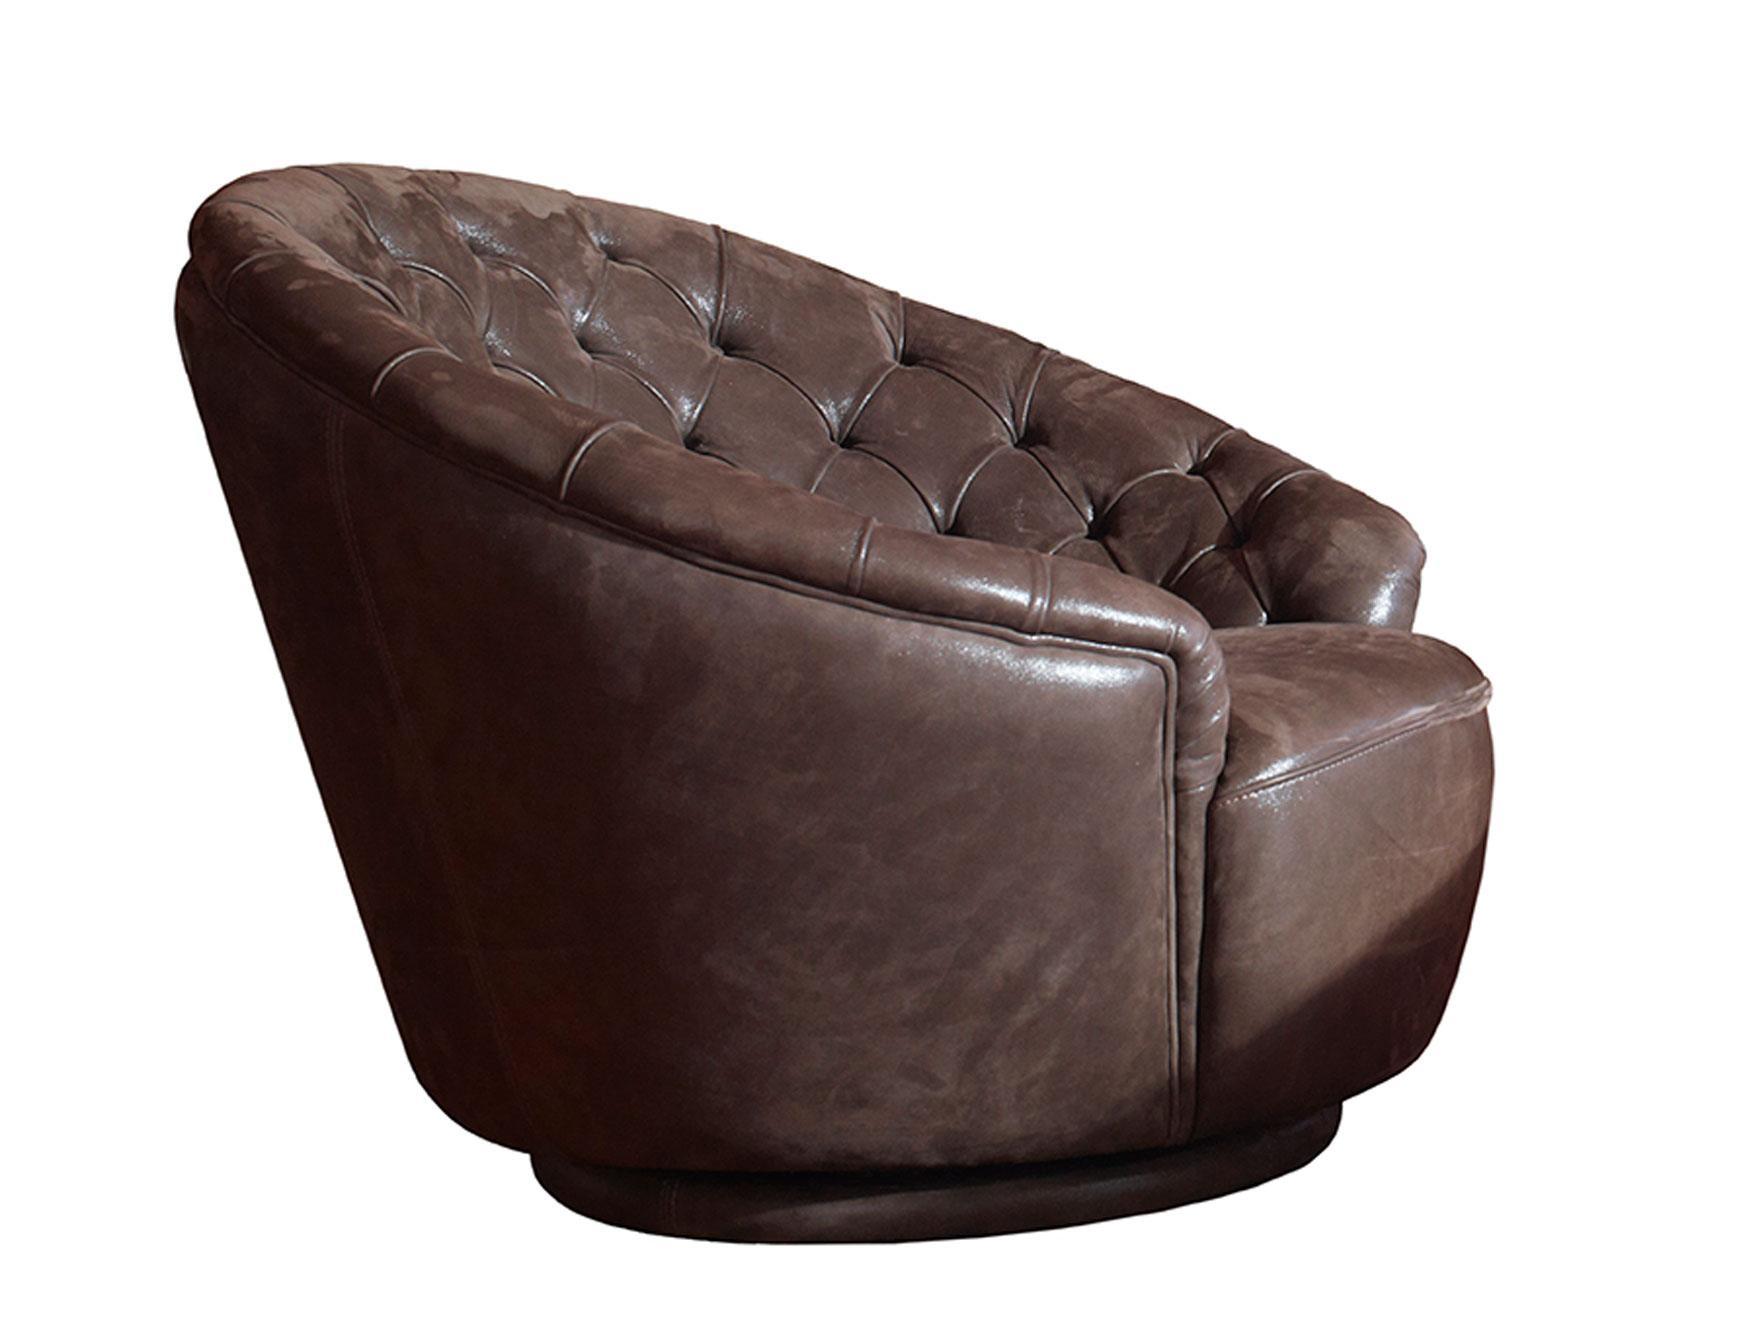 Italian Designer Luxury High End Sofas & Sofa Chairs: Nella Vetrina Pertaining To Wide Sofa Chairs (Image 8 of 20)